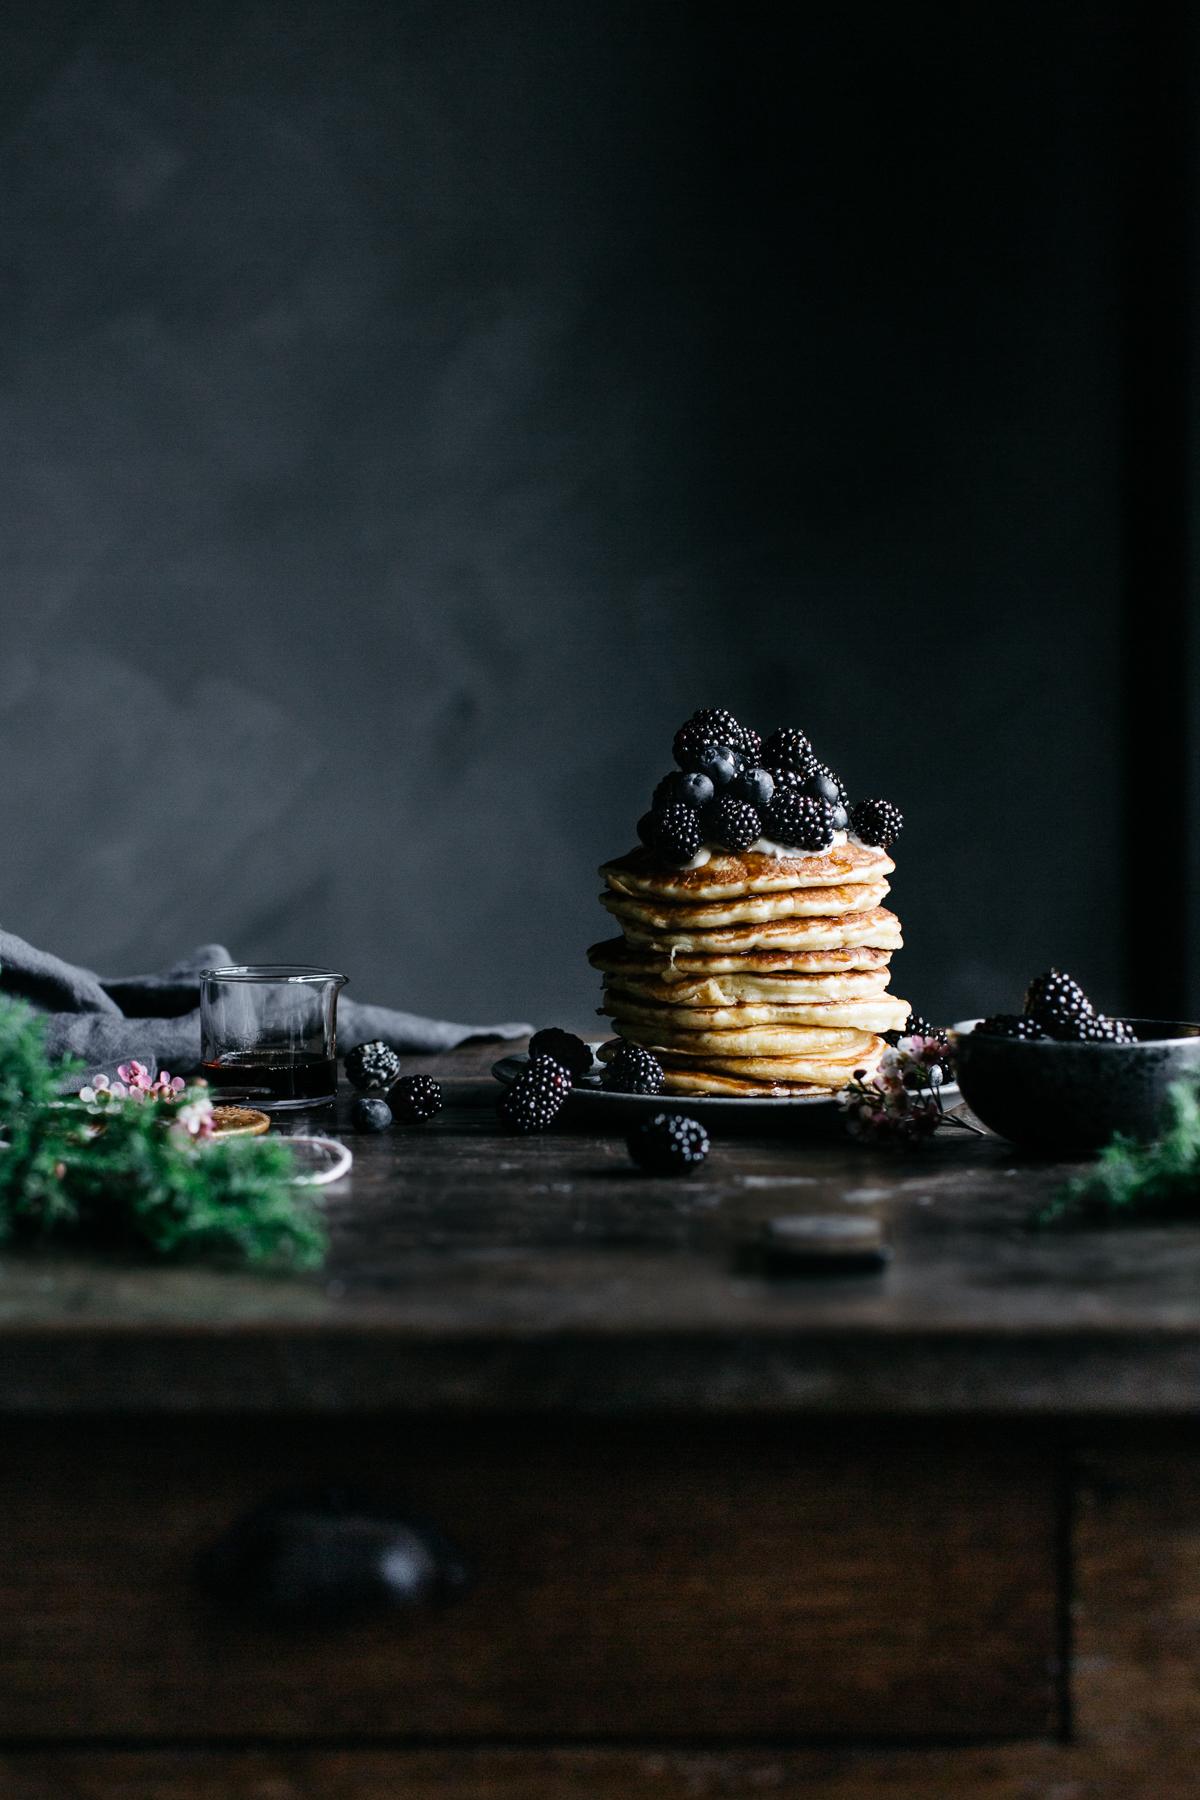 sm-food-dark-7.jpg